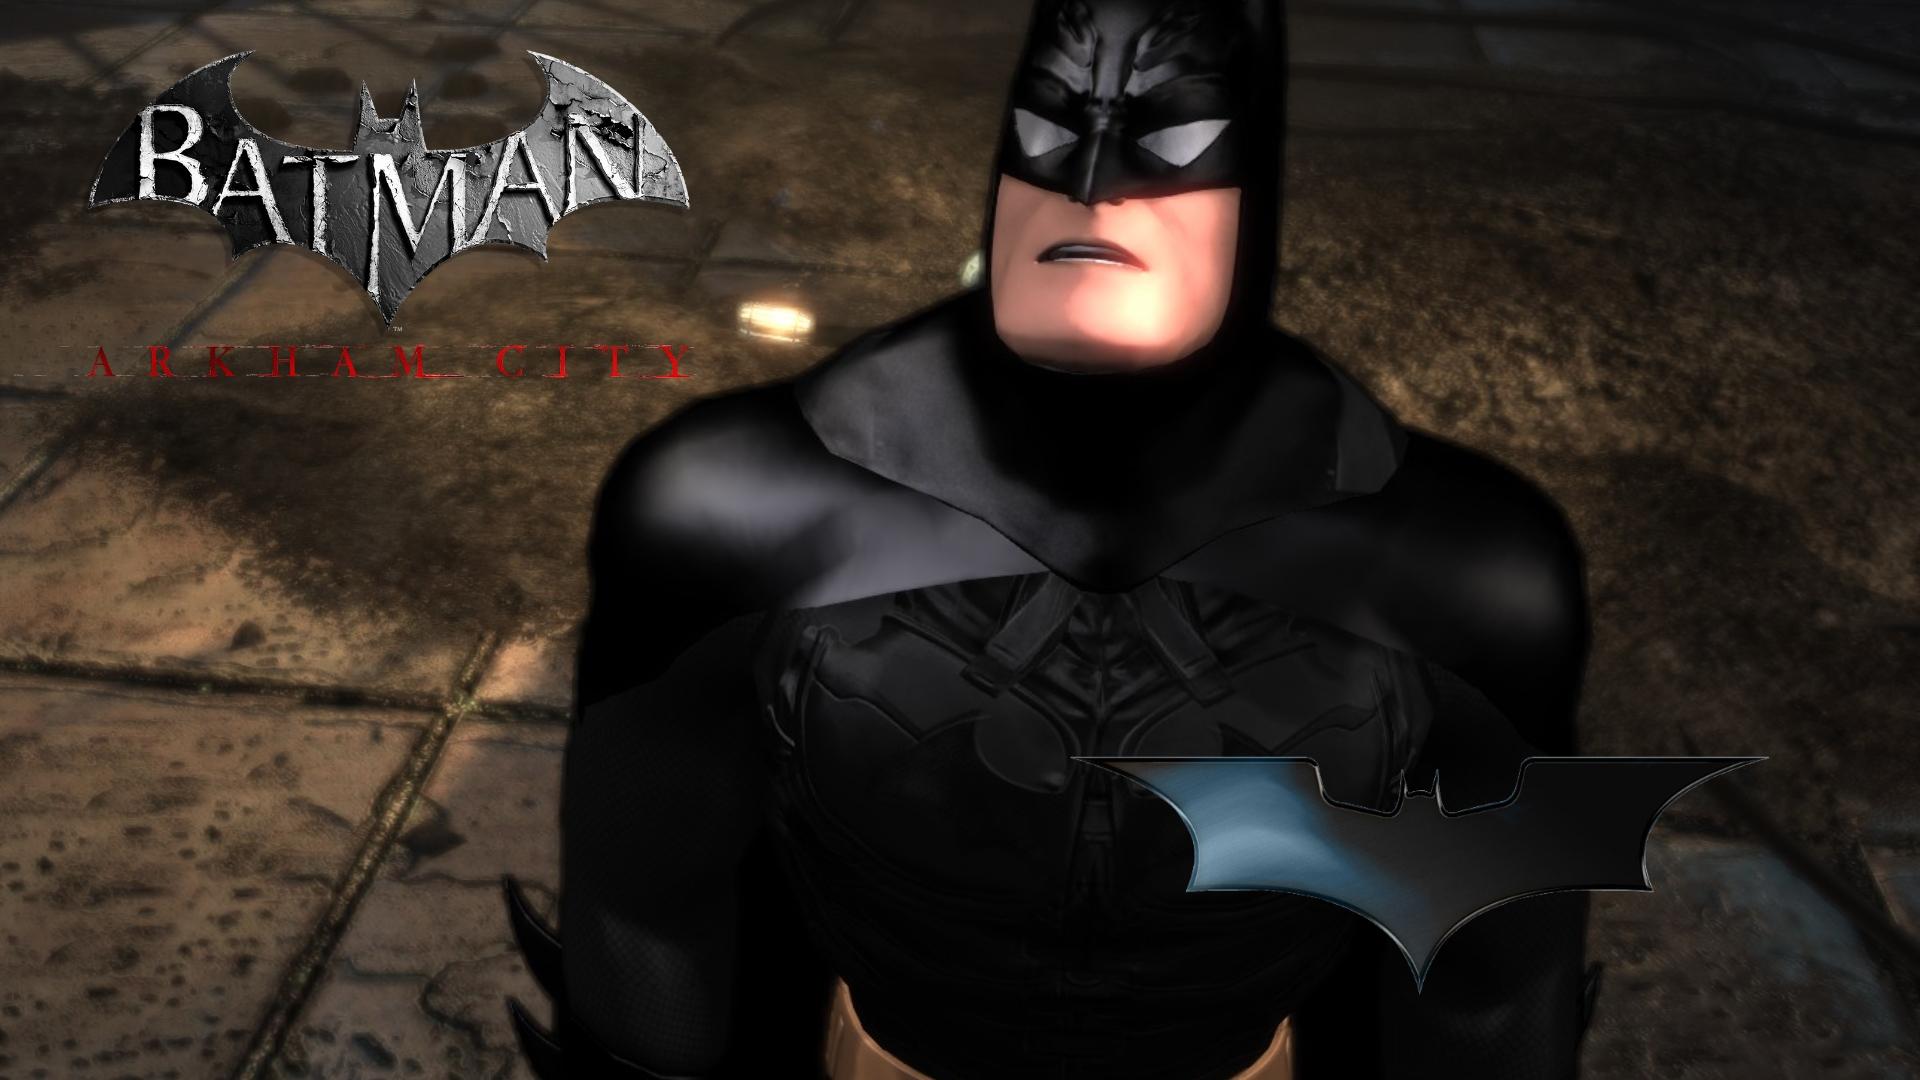 Animated Batman Begins skin mod for Arkham City by ...